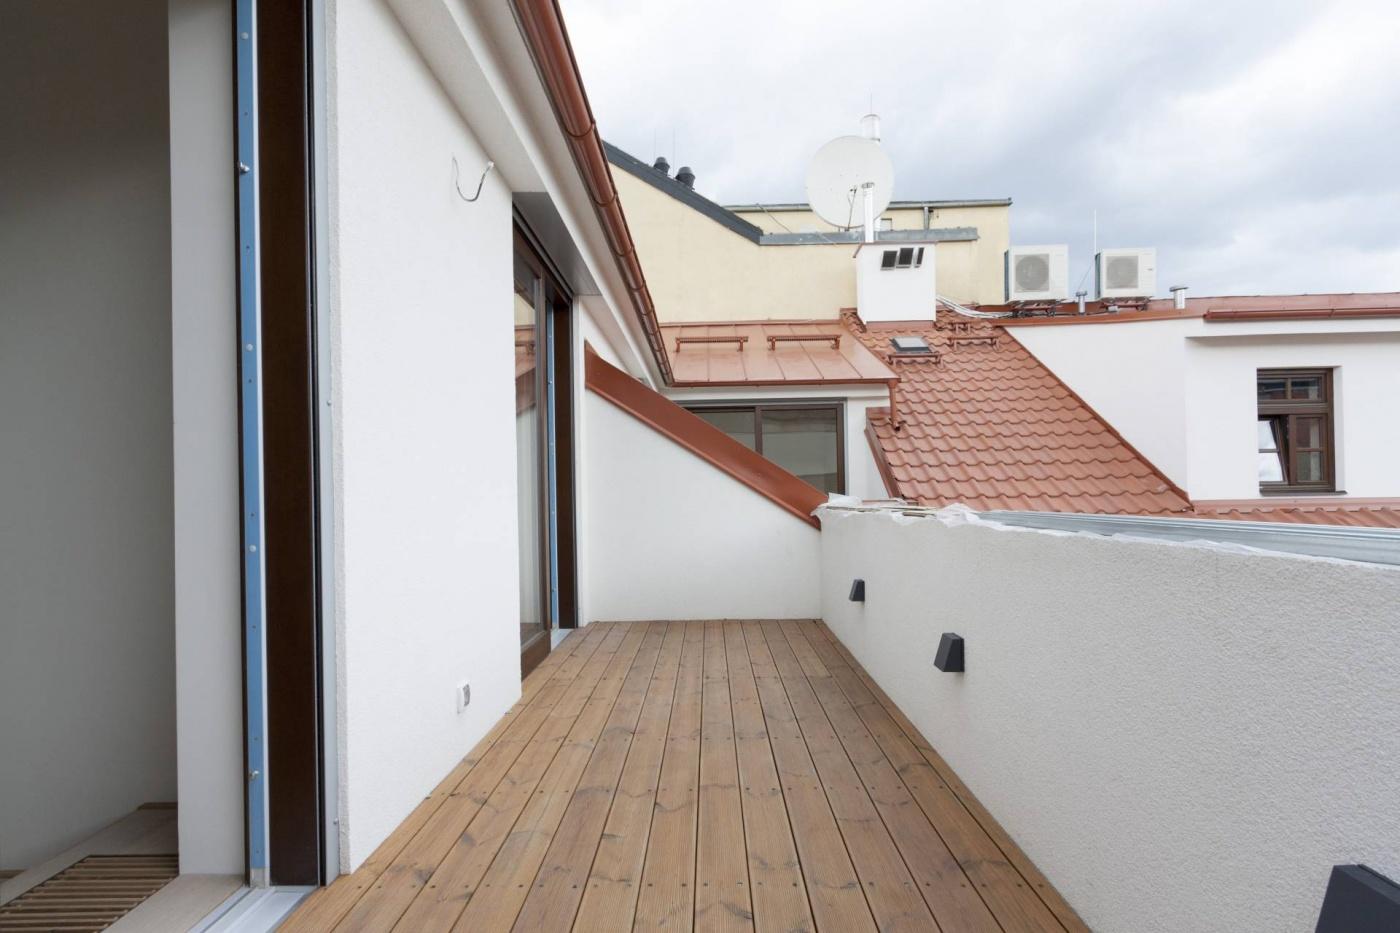 Půdní byt 3+1, plocha 98 m², ulice Lumírova, Praha 2 - Vyšehrad   1